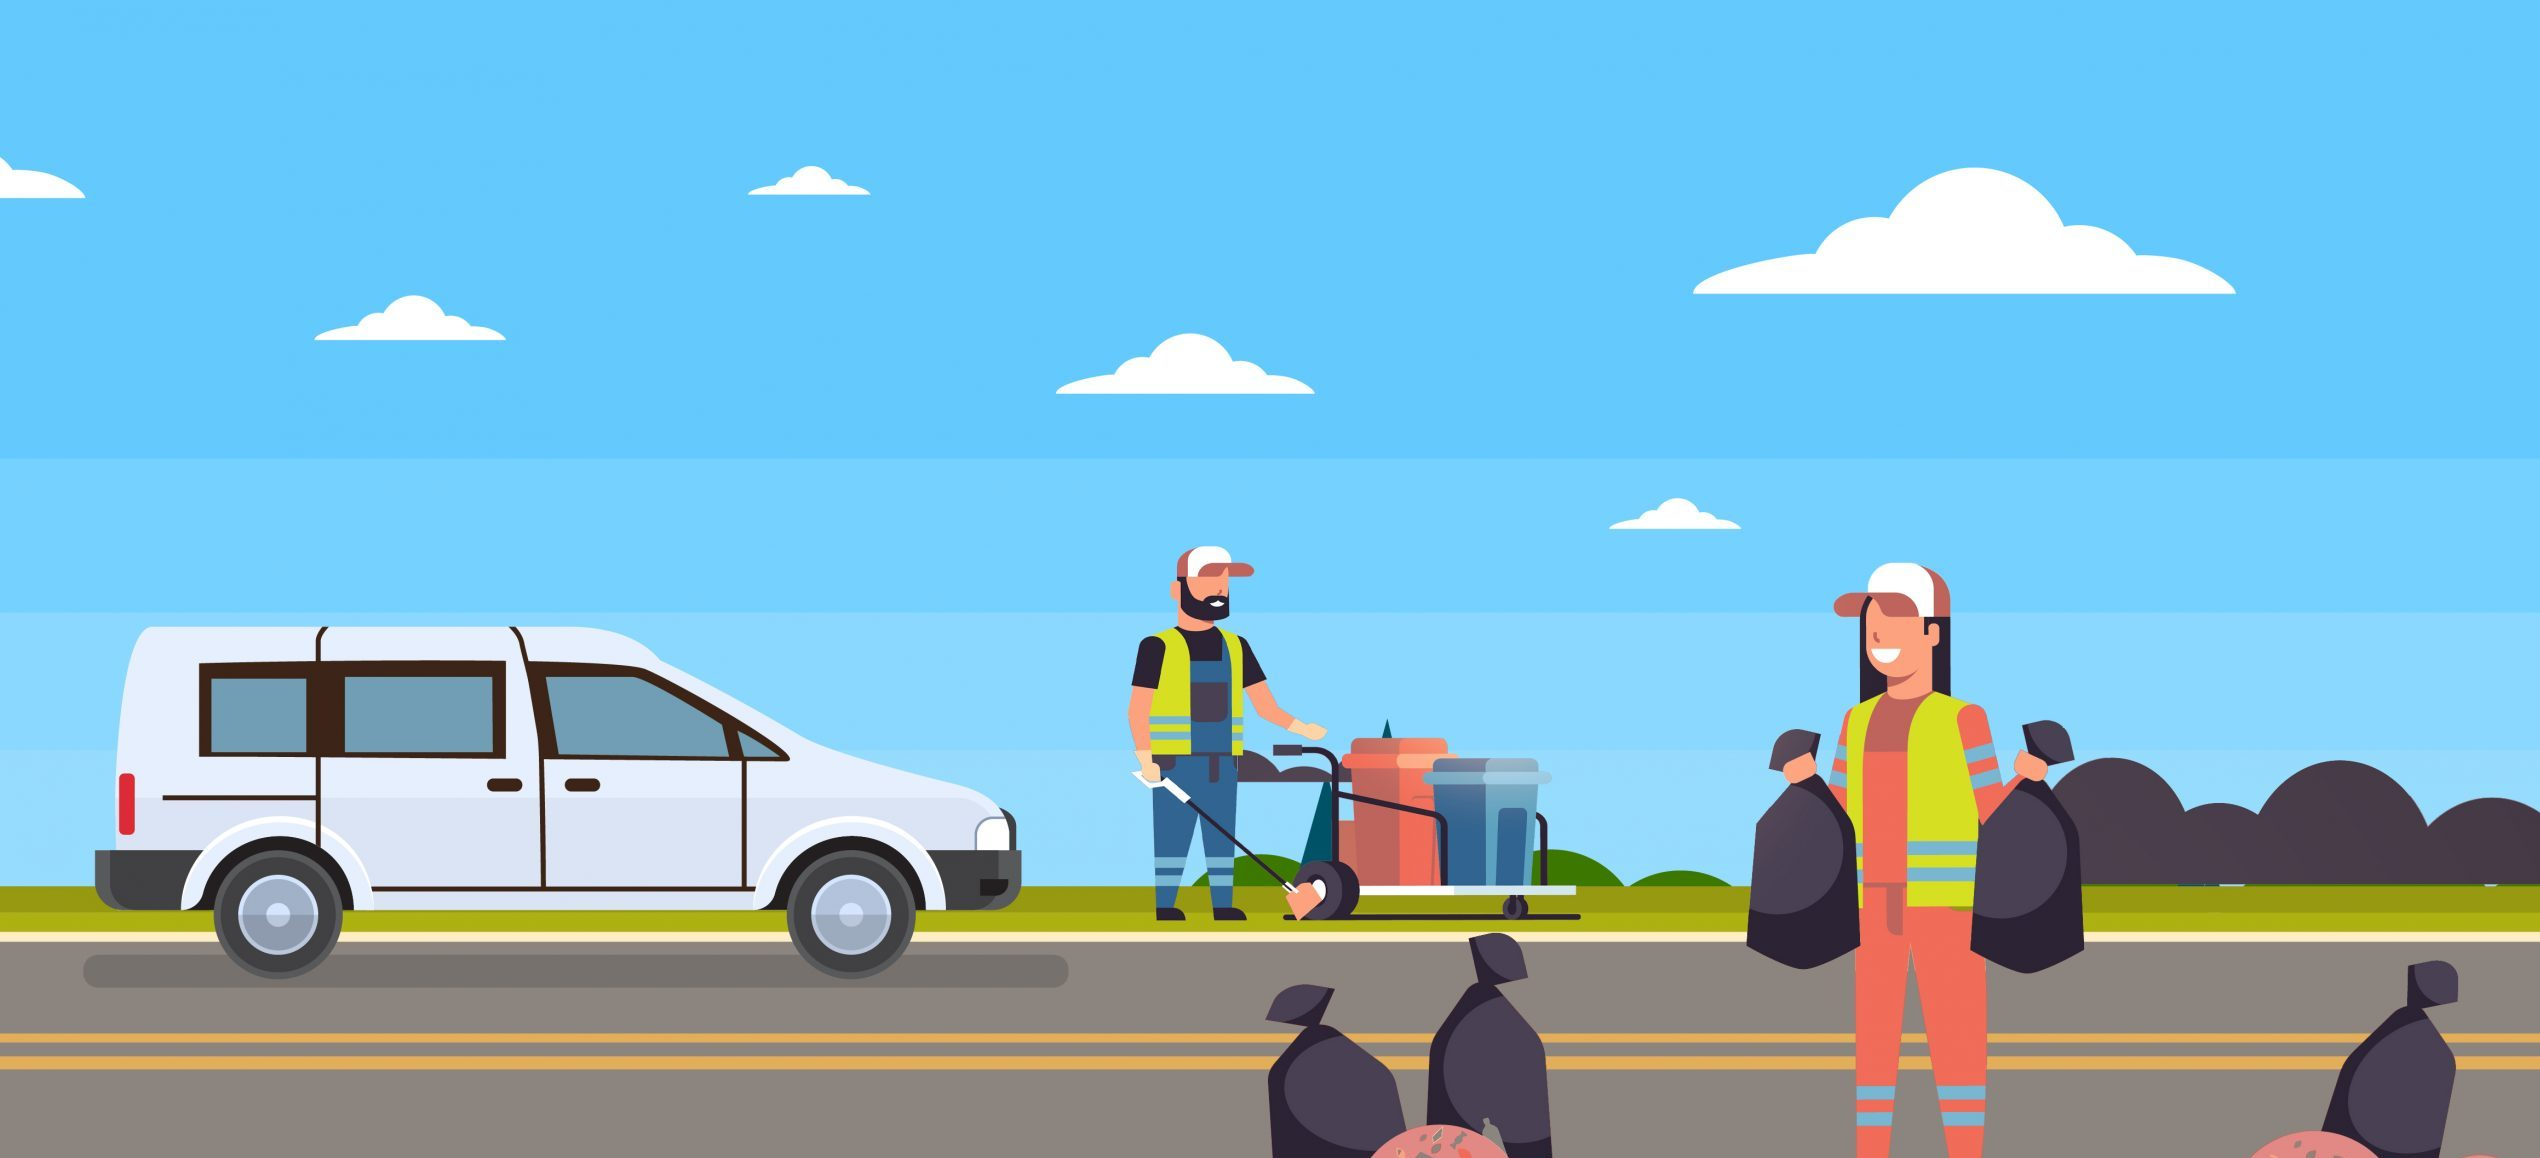 Roadside Clean up